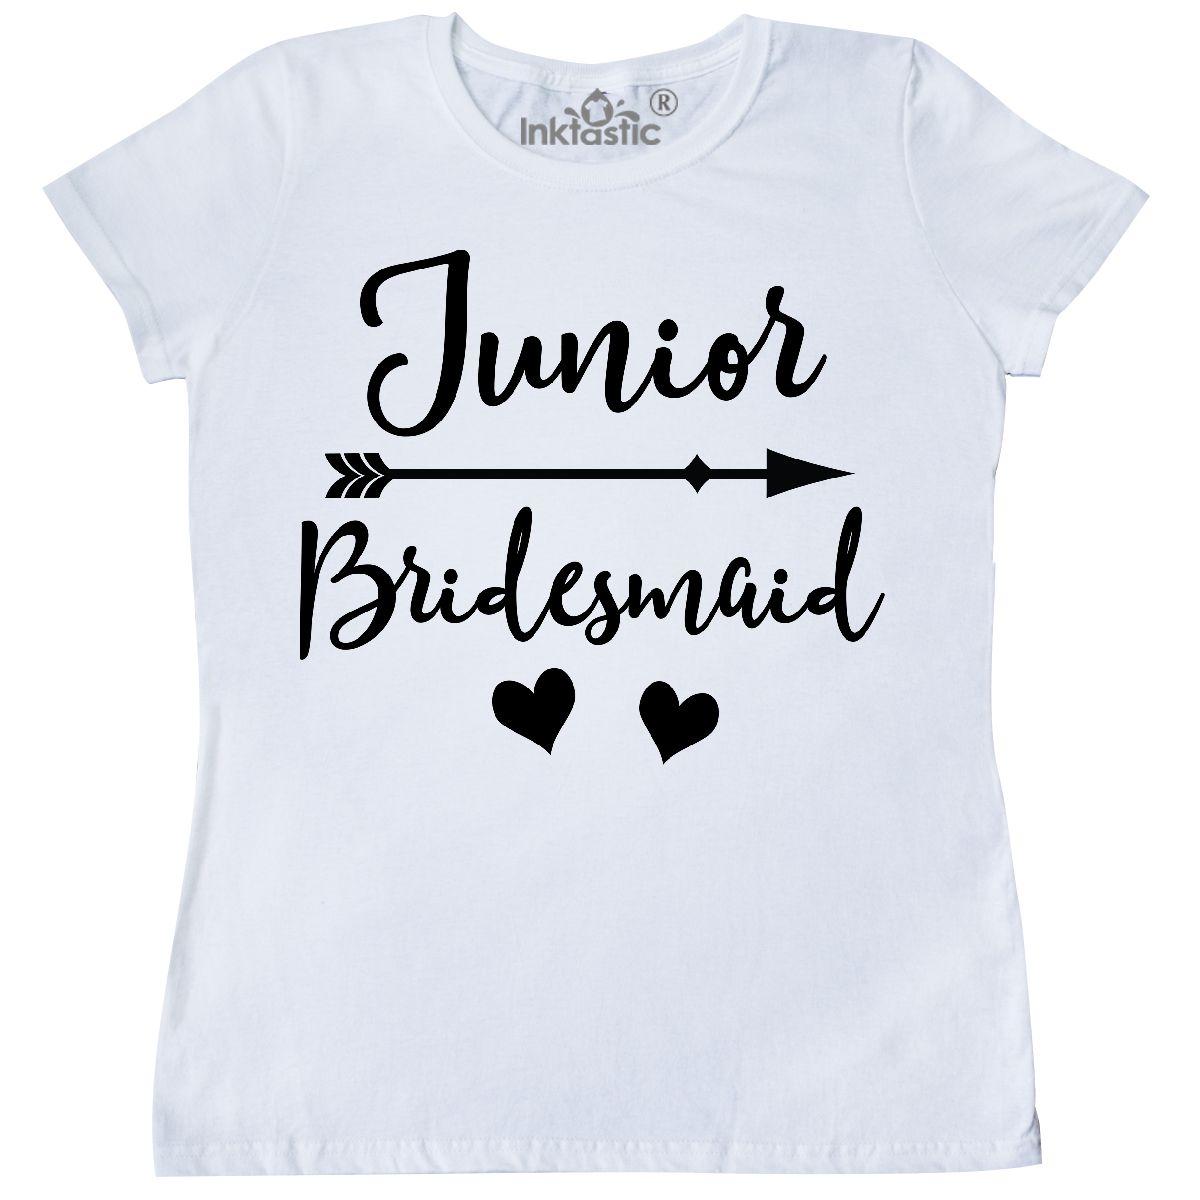 6292a5311f09a Junior Bridesmaid Wedding Bridal Party Gift Women's T-Shirt White Small